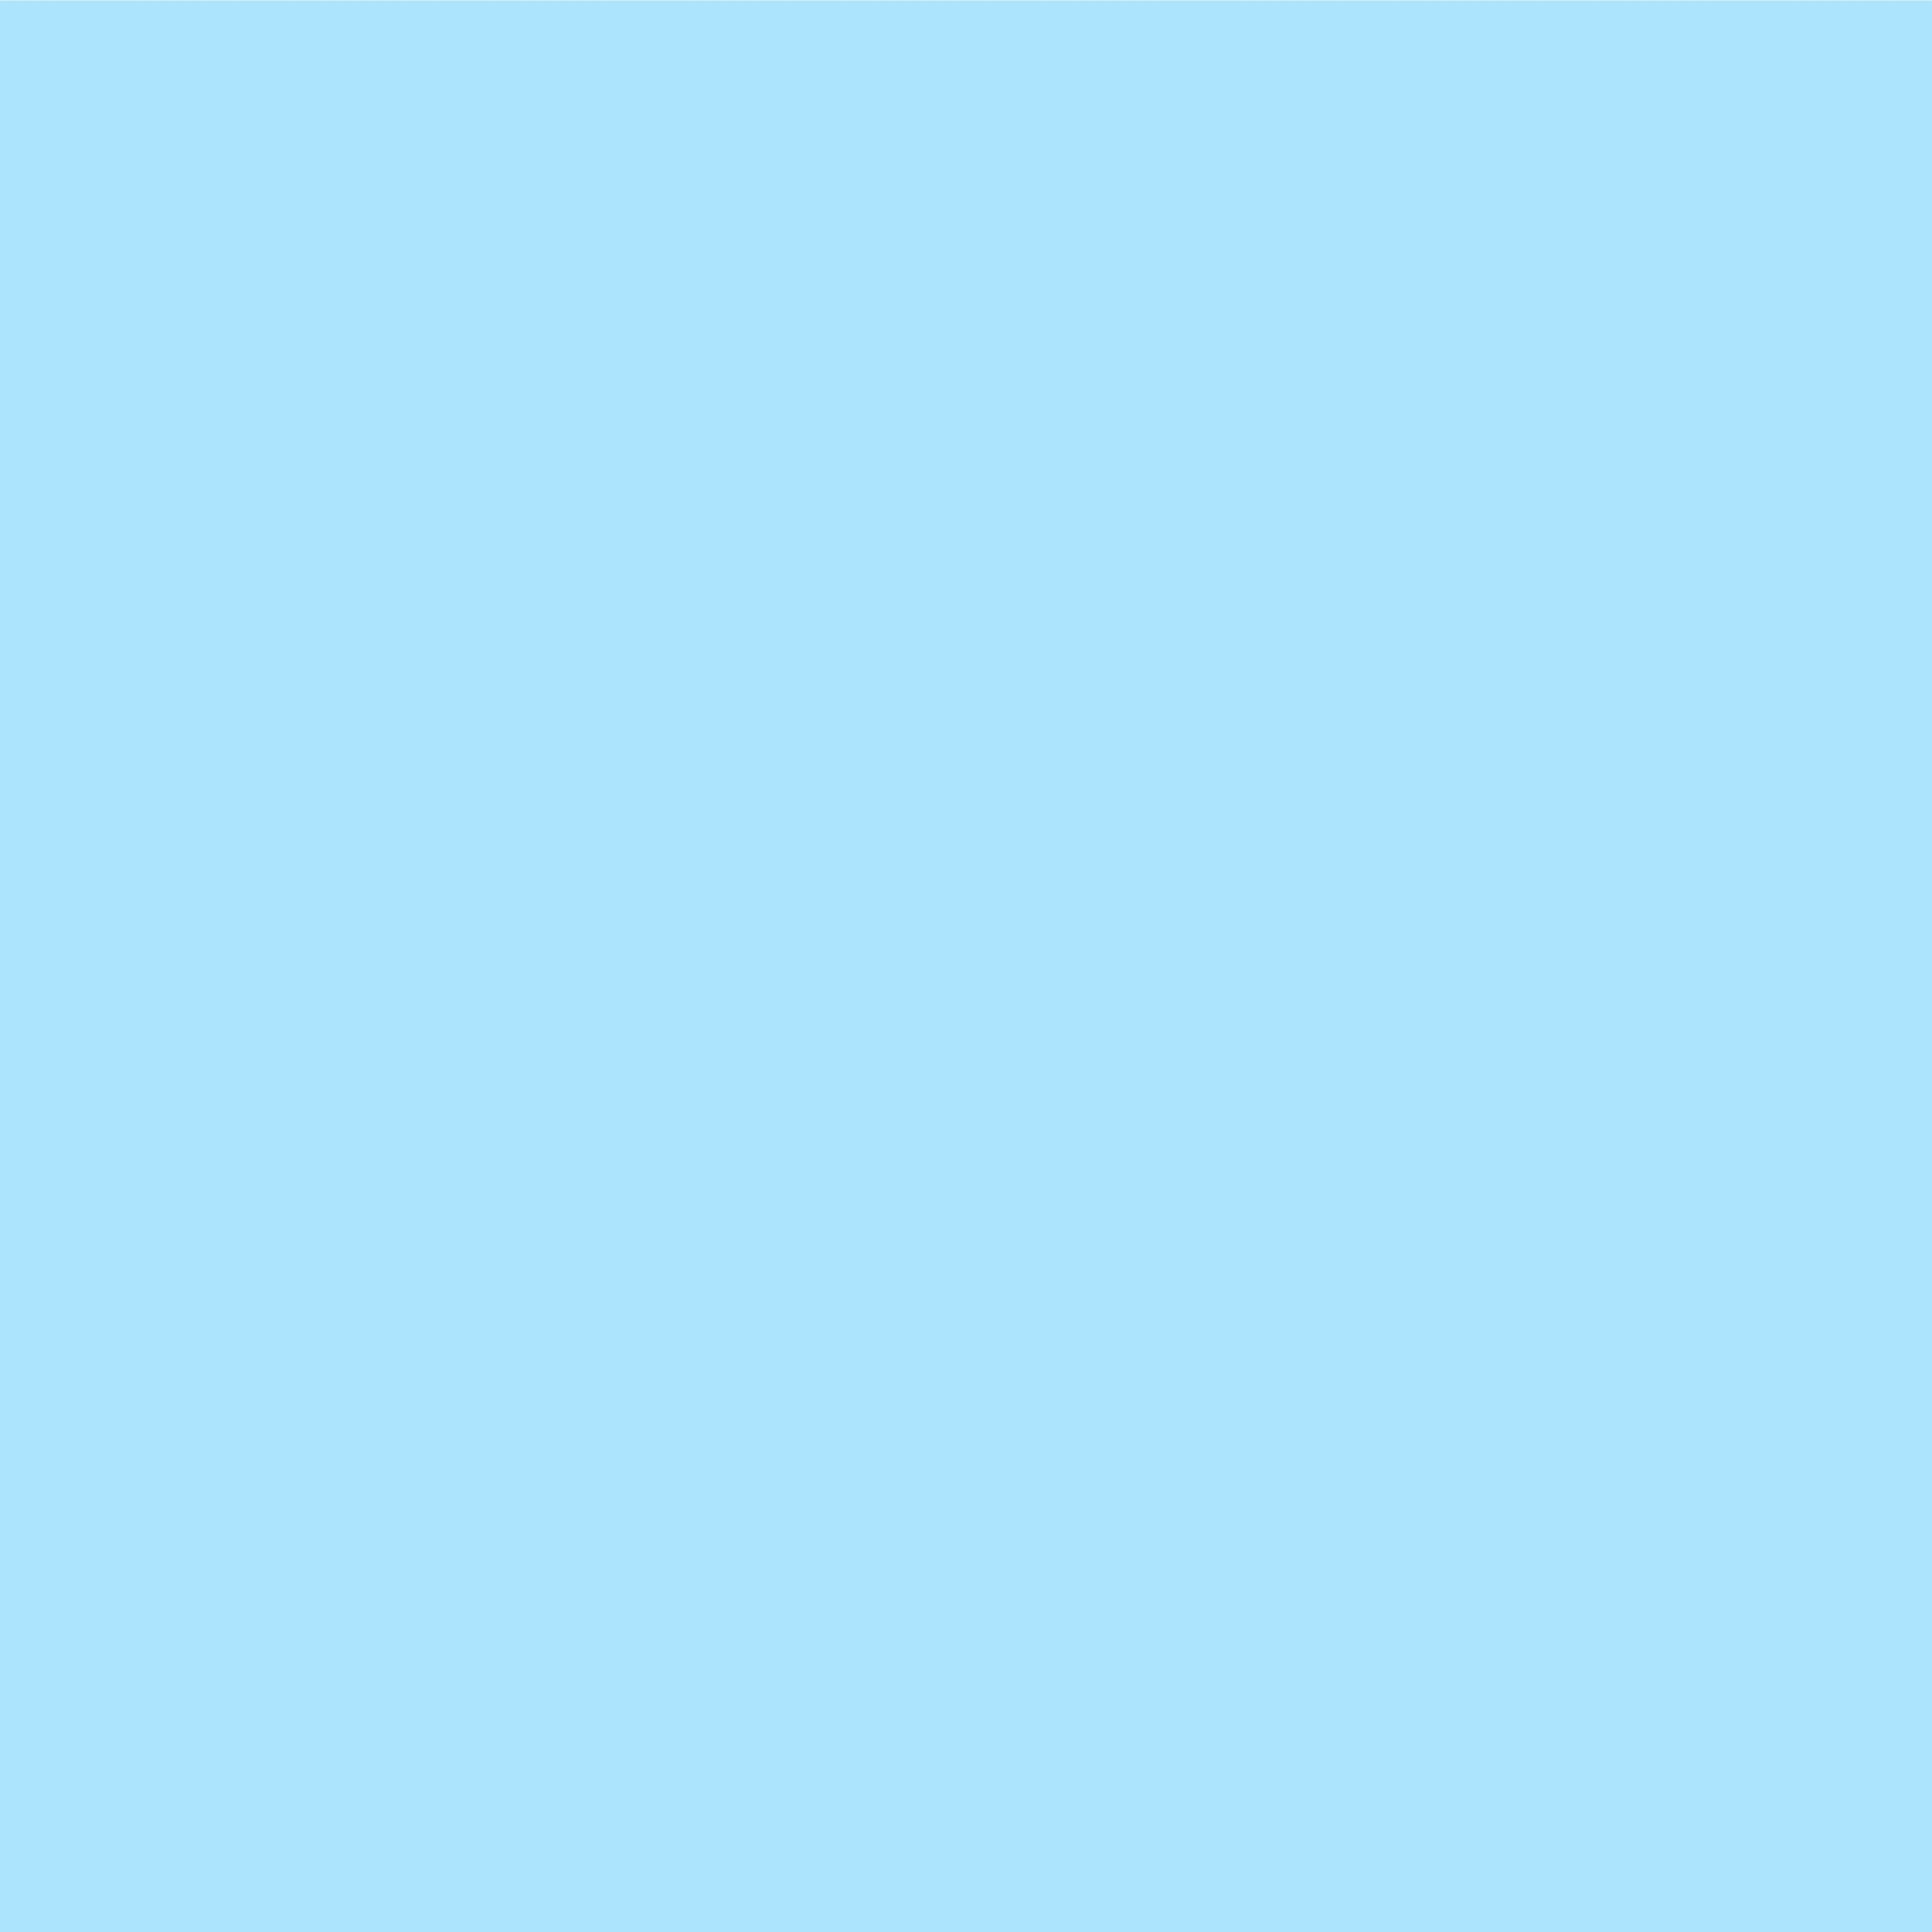 STRVN ARTST 28    Spotify  |  Apple Music